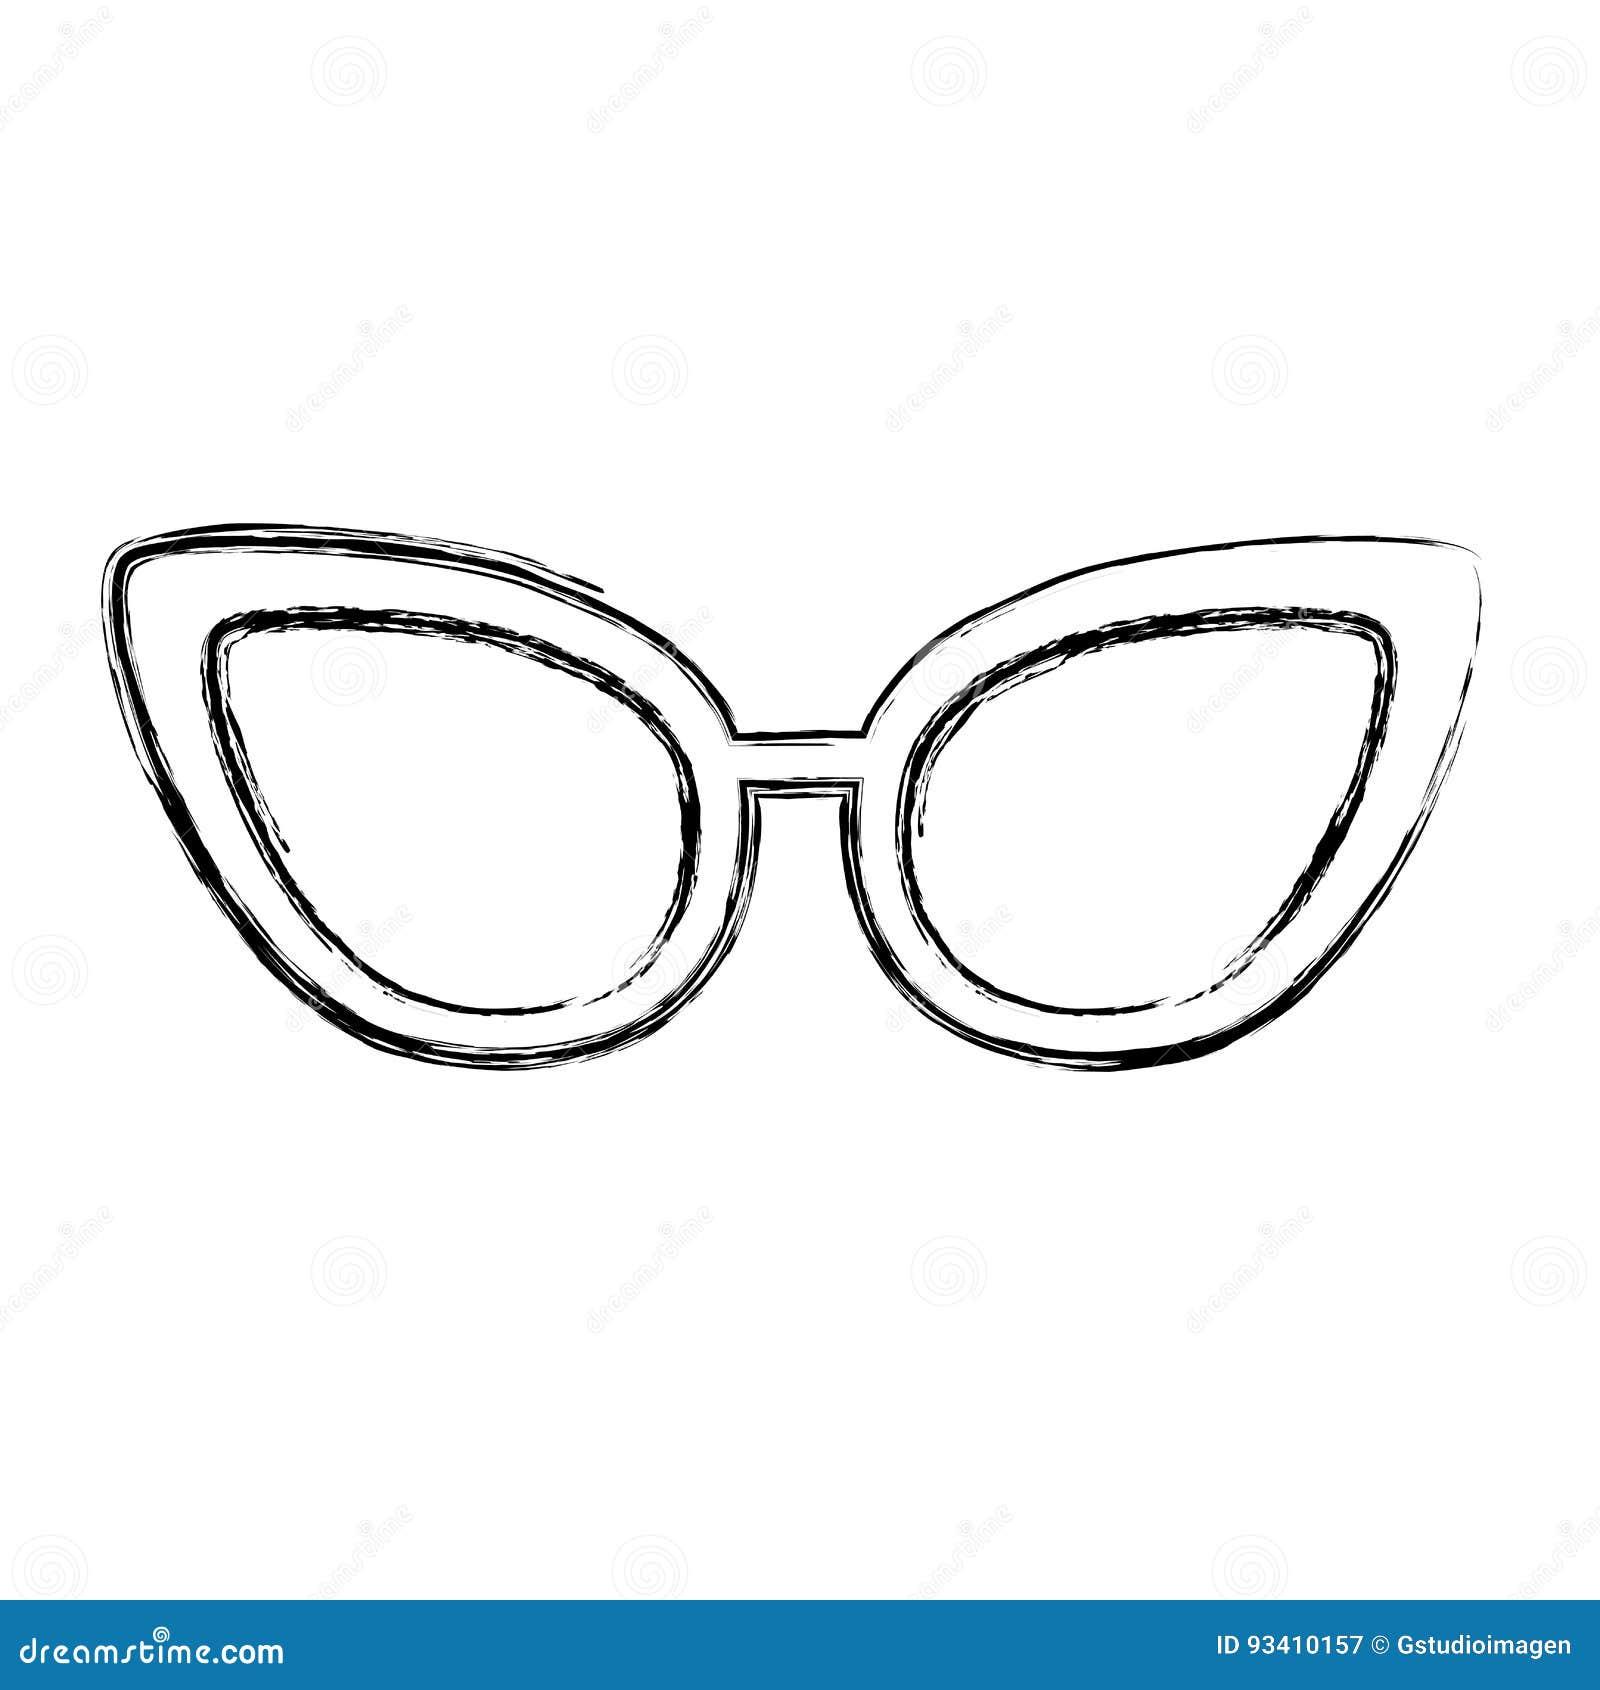 5f0391c0bdae Sketch Draw Sunglasses Cartoon Stock Vector - Illustration of ...